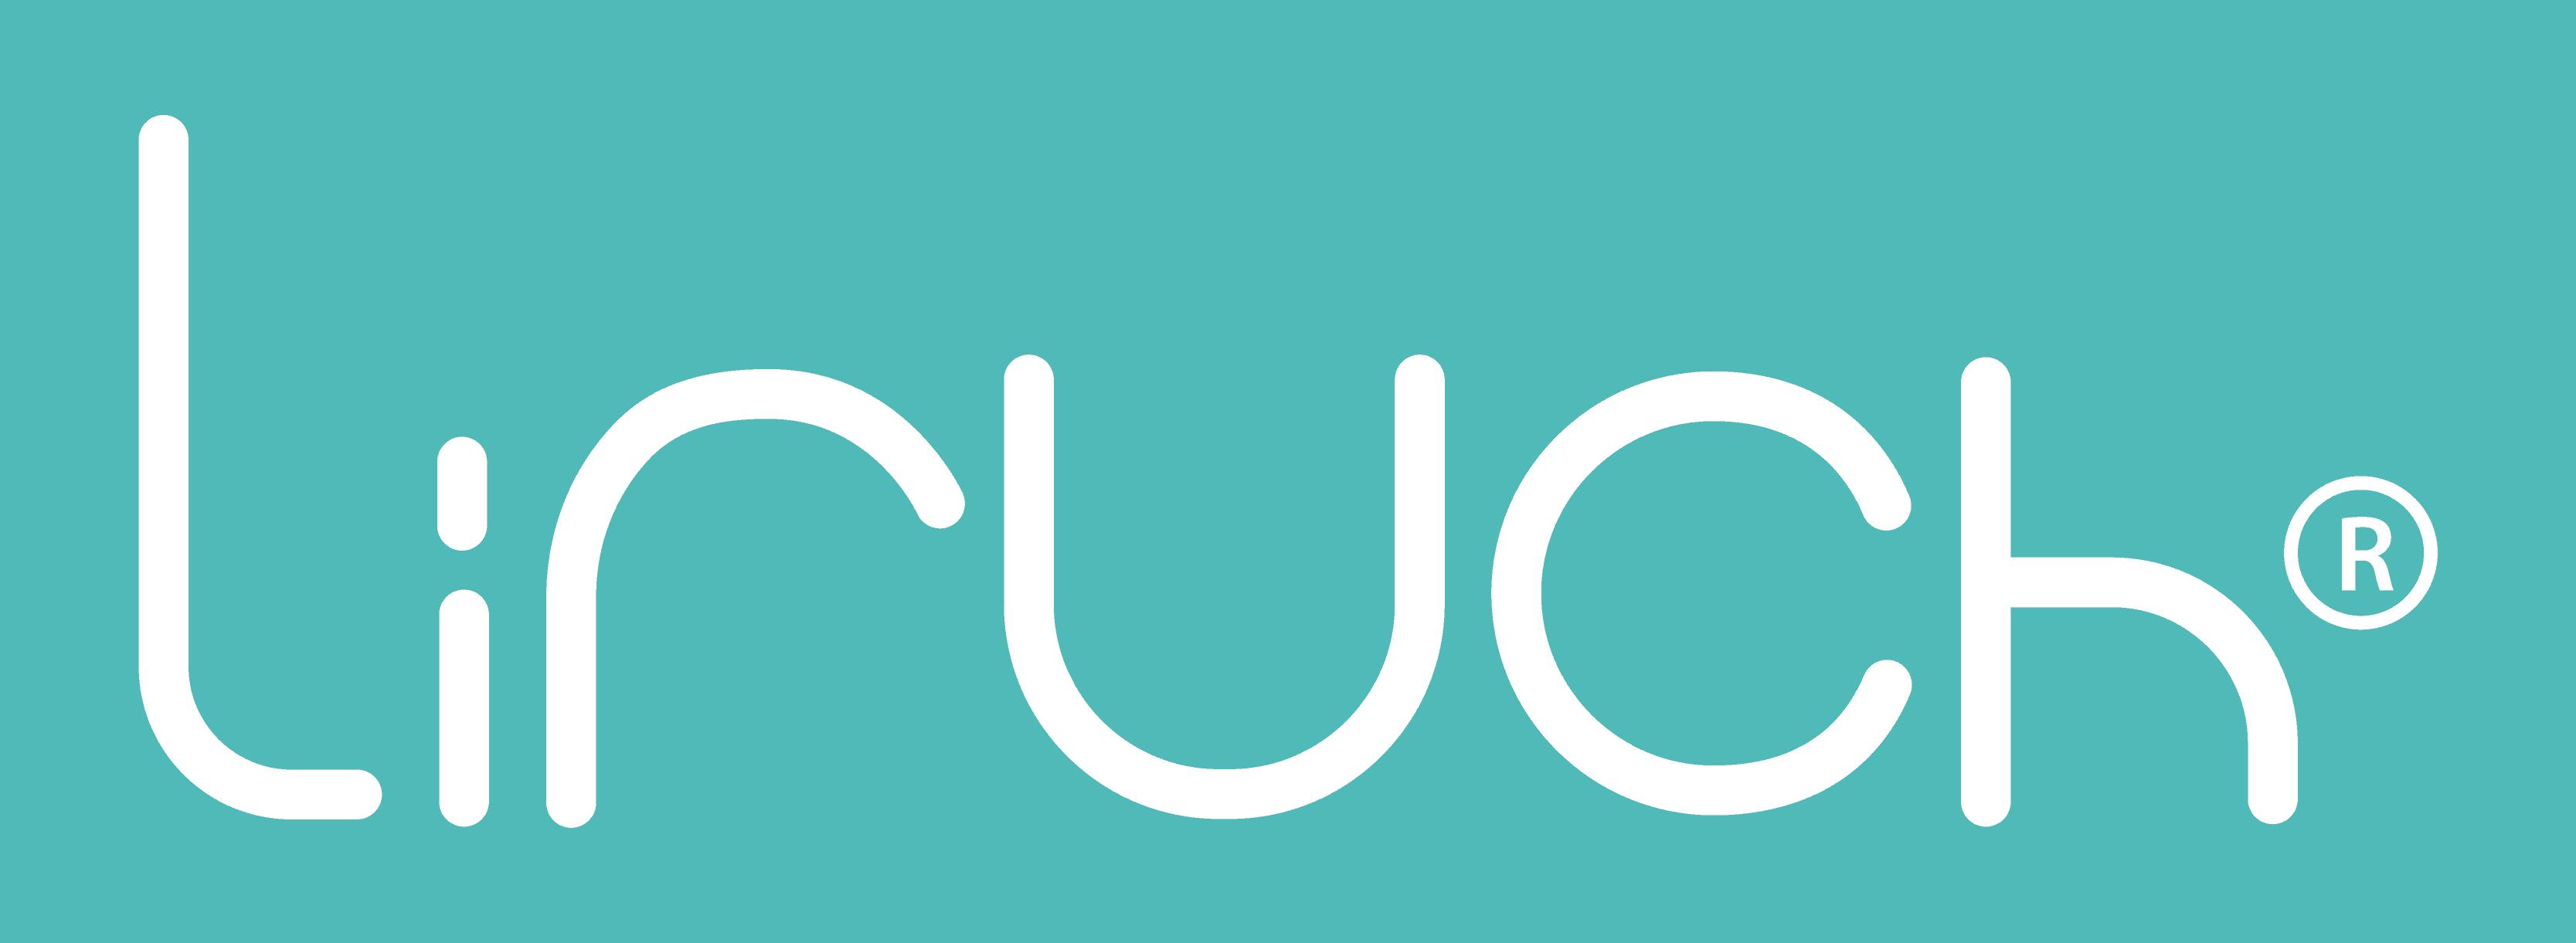 logotipo liruch